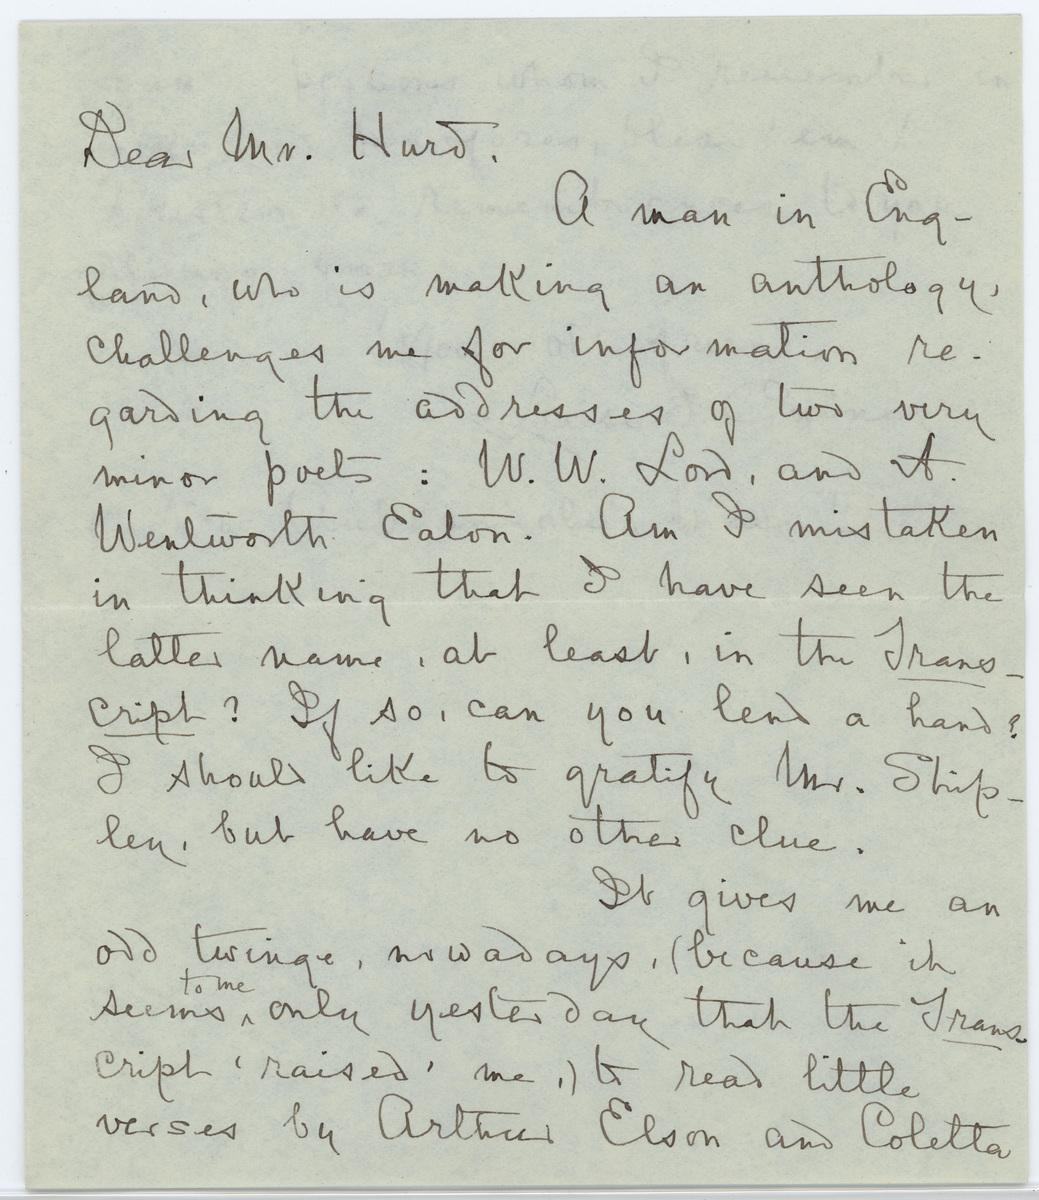 Louise Imogen Guiney letter  Mr. Hurd page 1